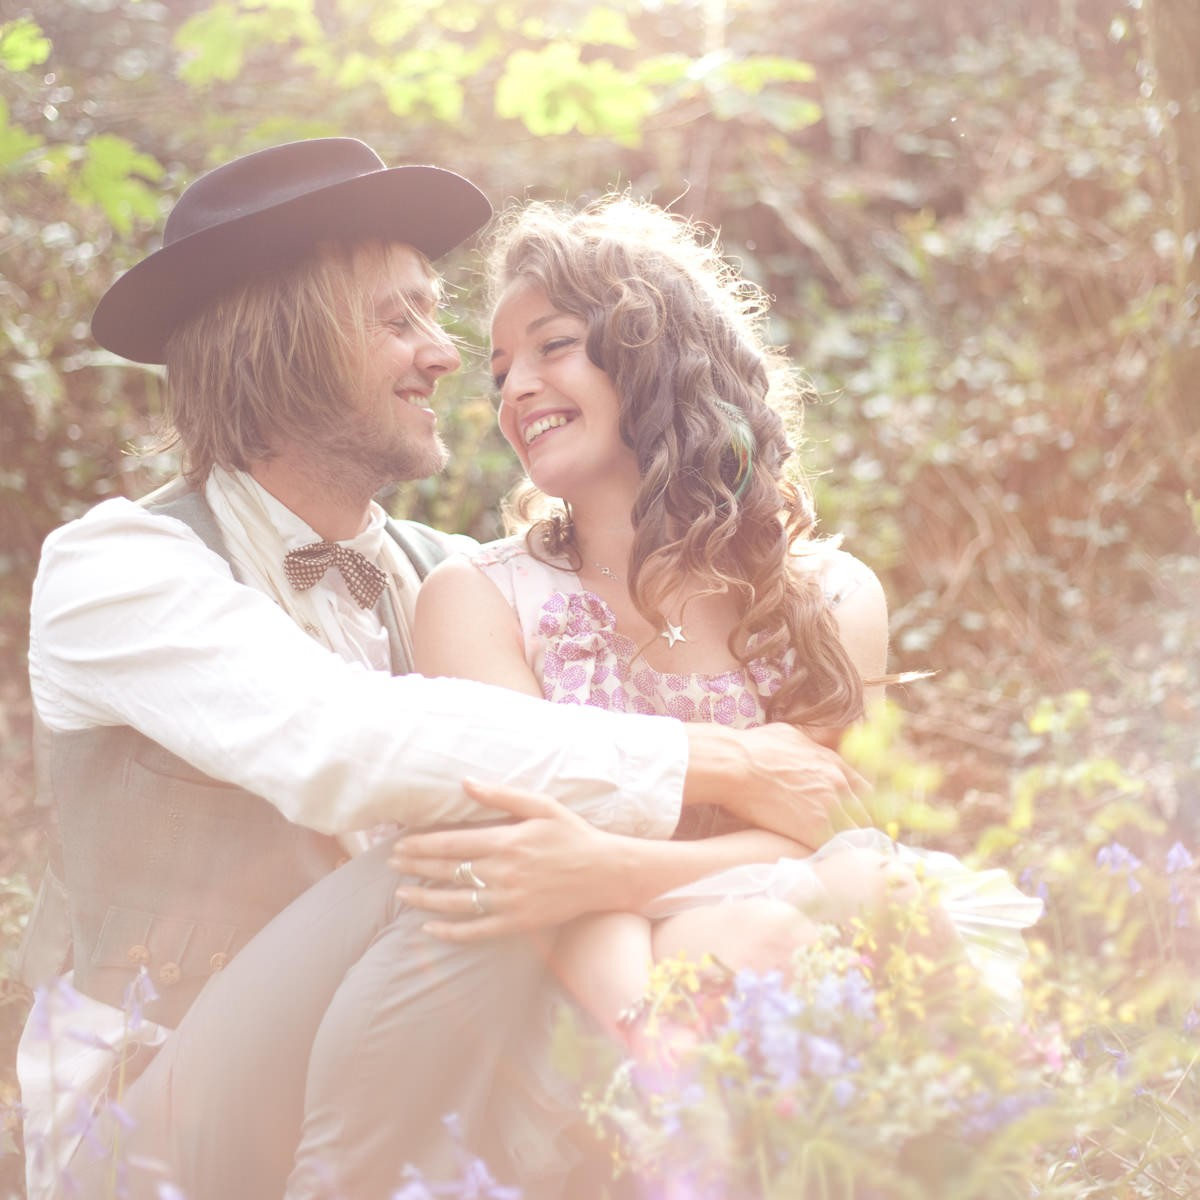 Gypsy Bridal Shoot At Cornish Tipi Weddings